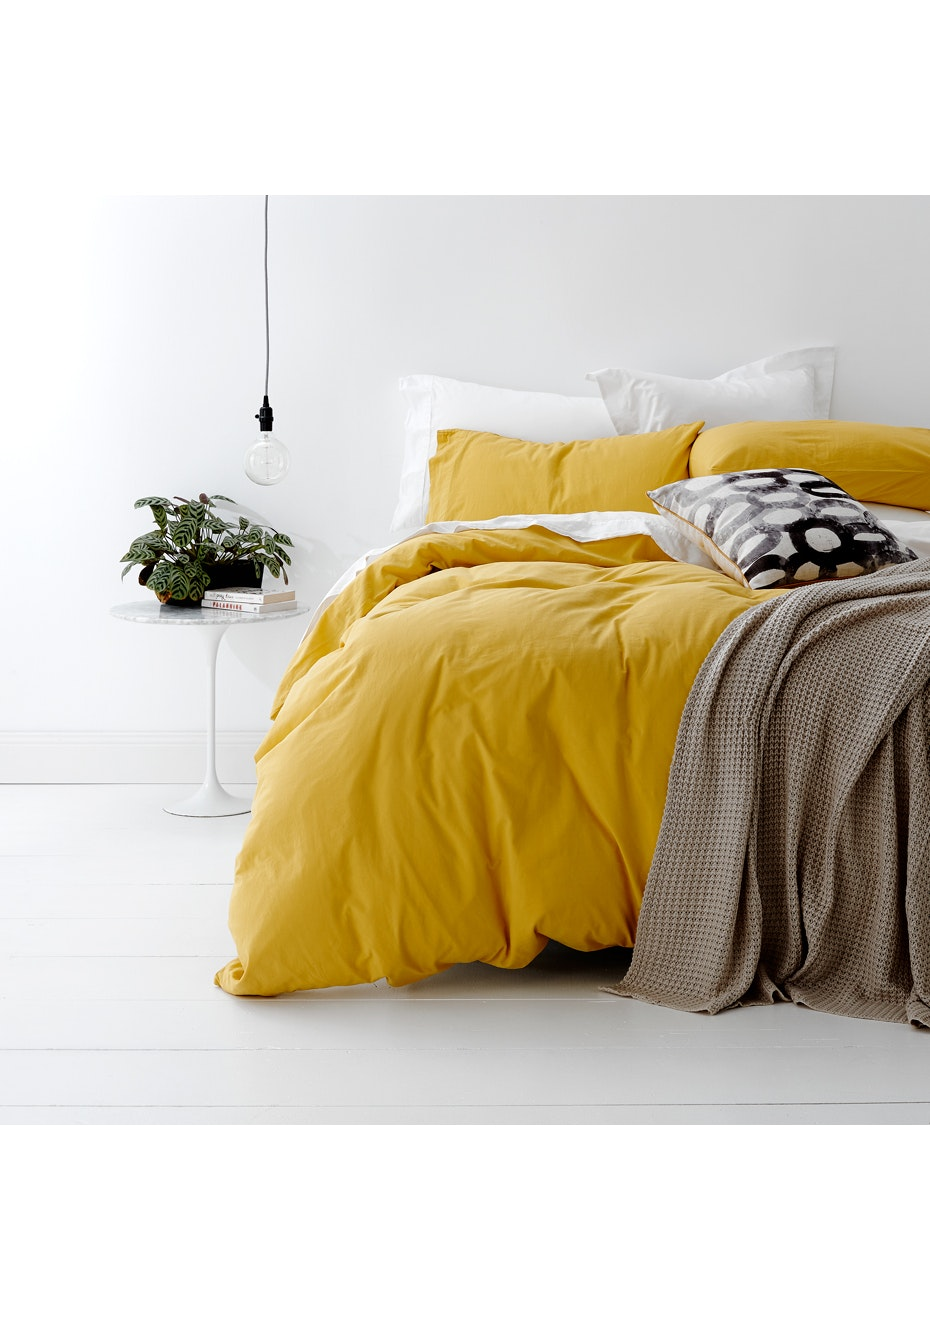 Park Avenue European Vintage Washed 100 % Cotton Quilt Cover Set Super King- Misted Yellow